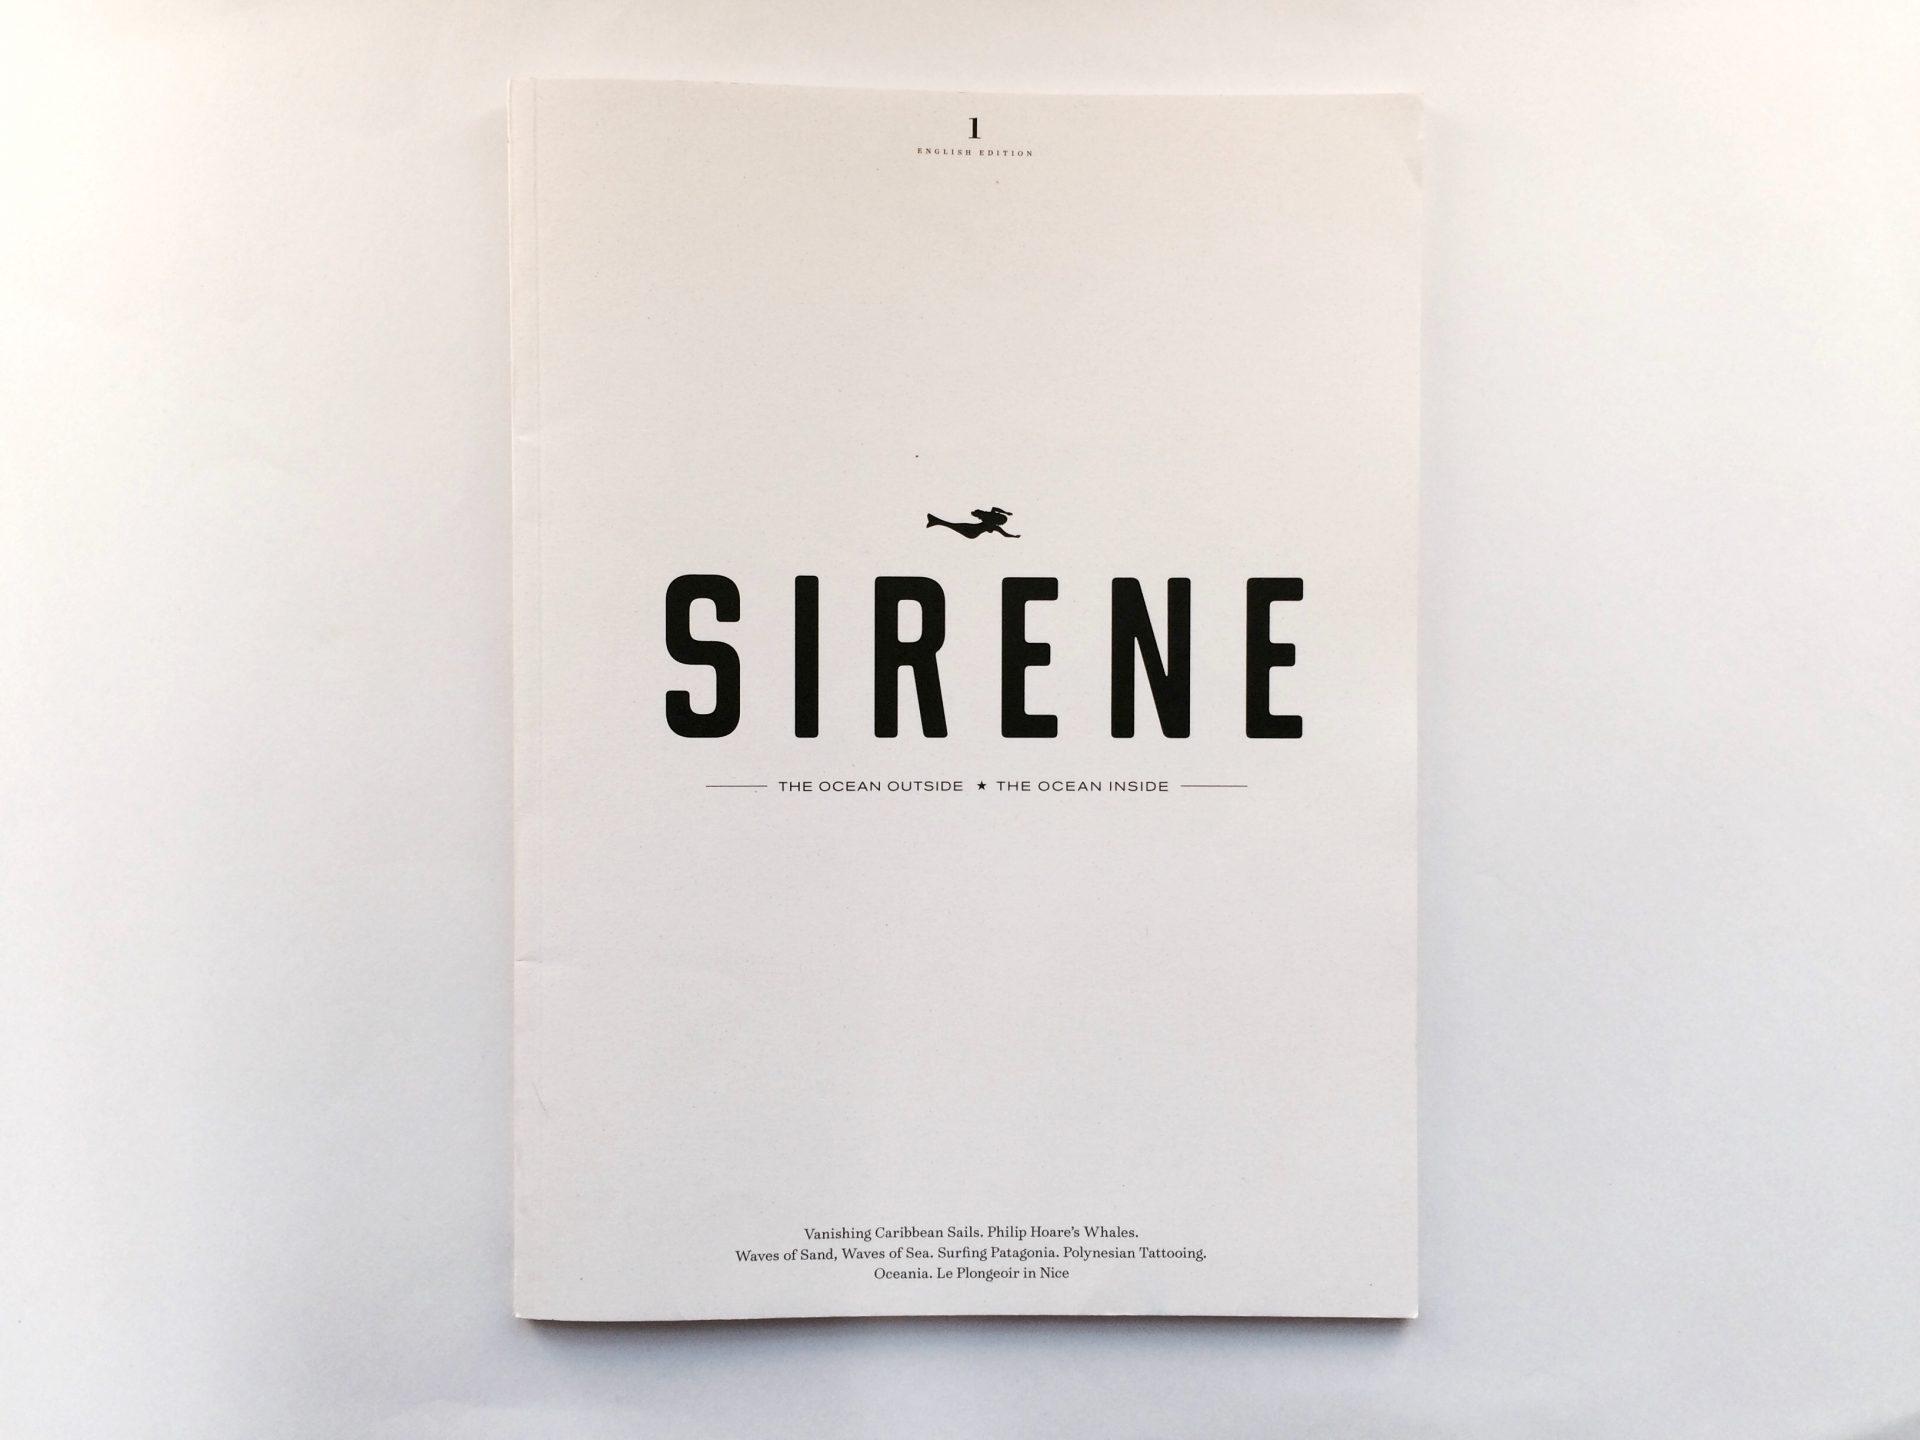 Sirene nº 1